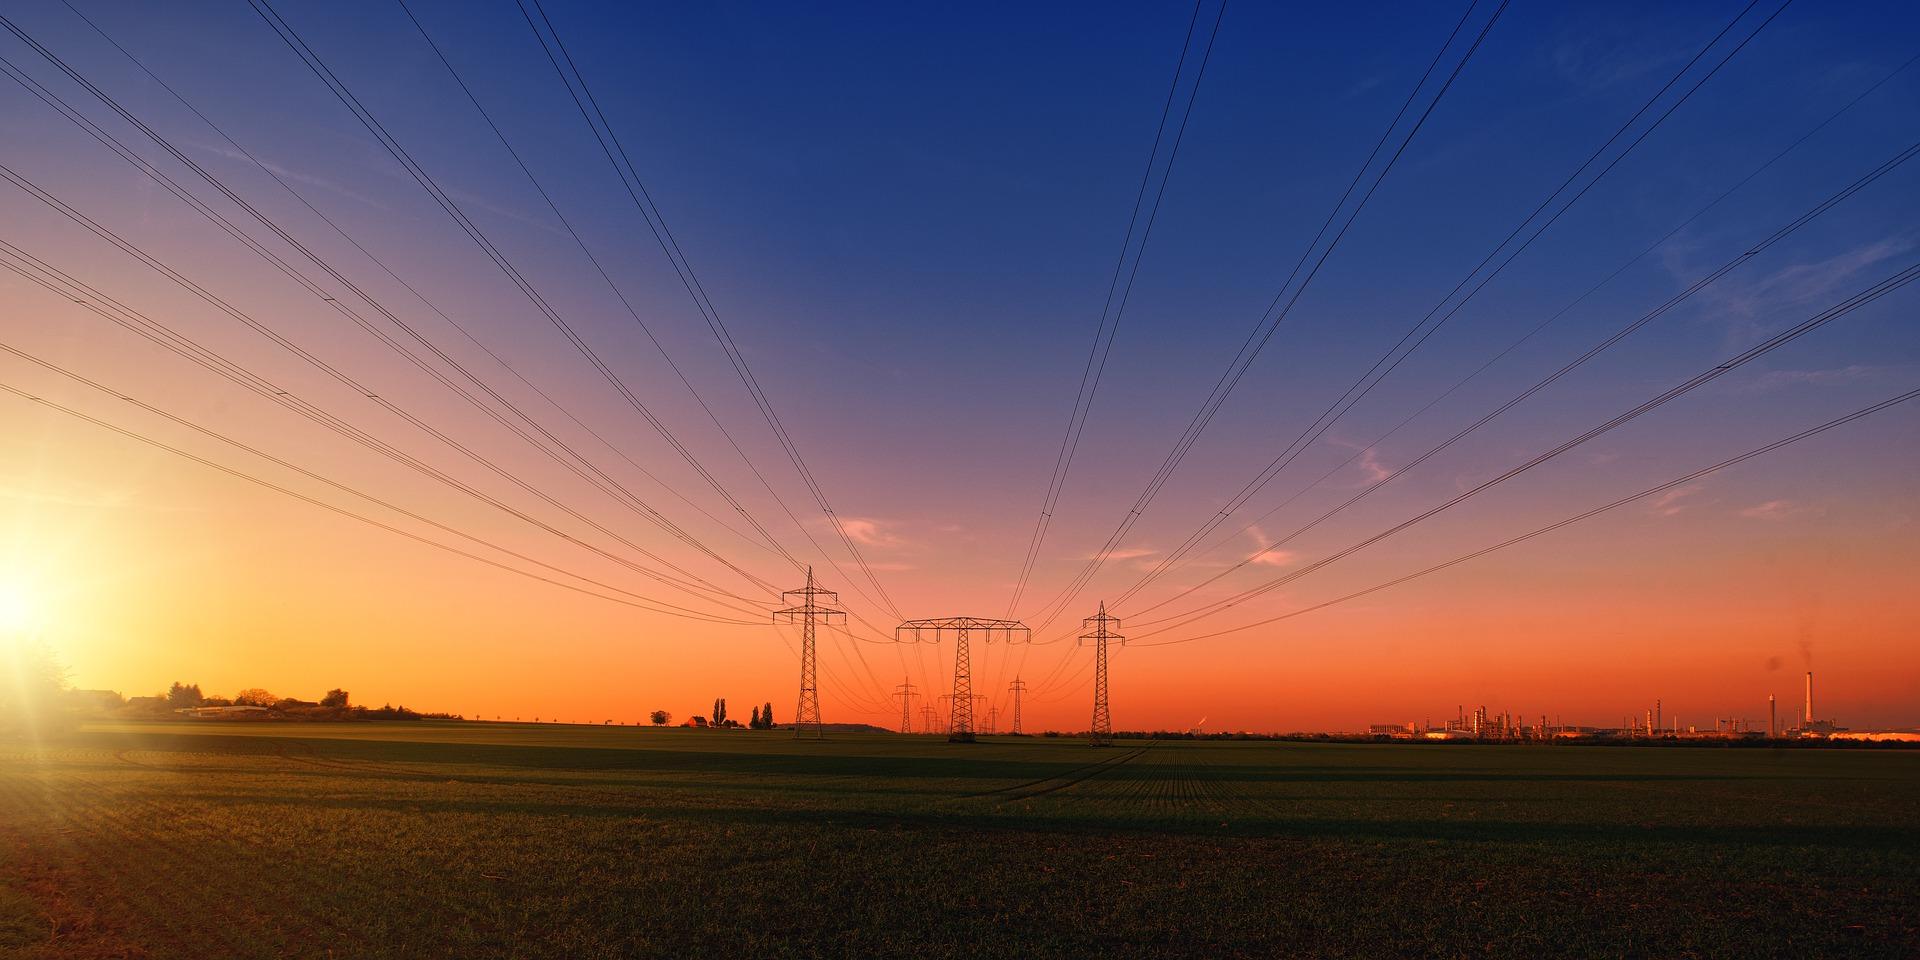 Elektrizität auf dem Feld